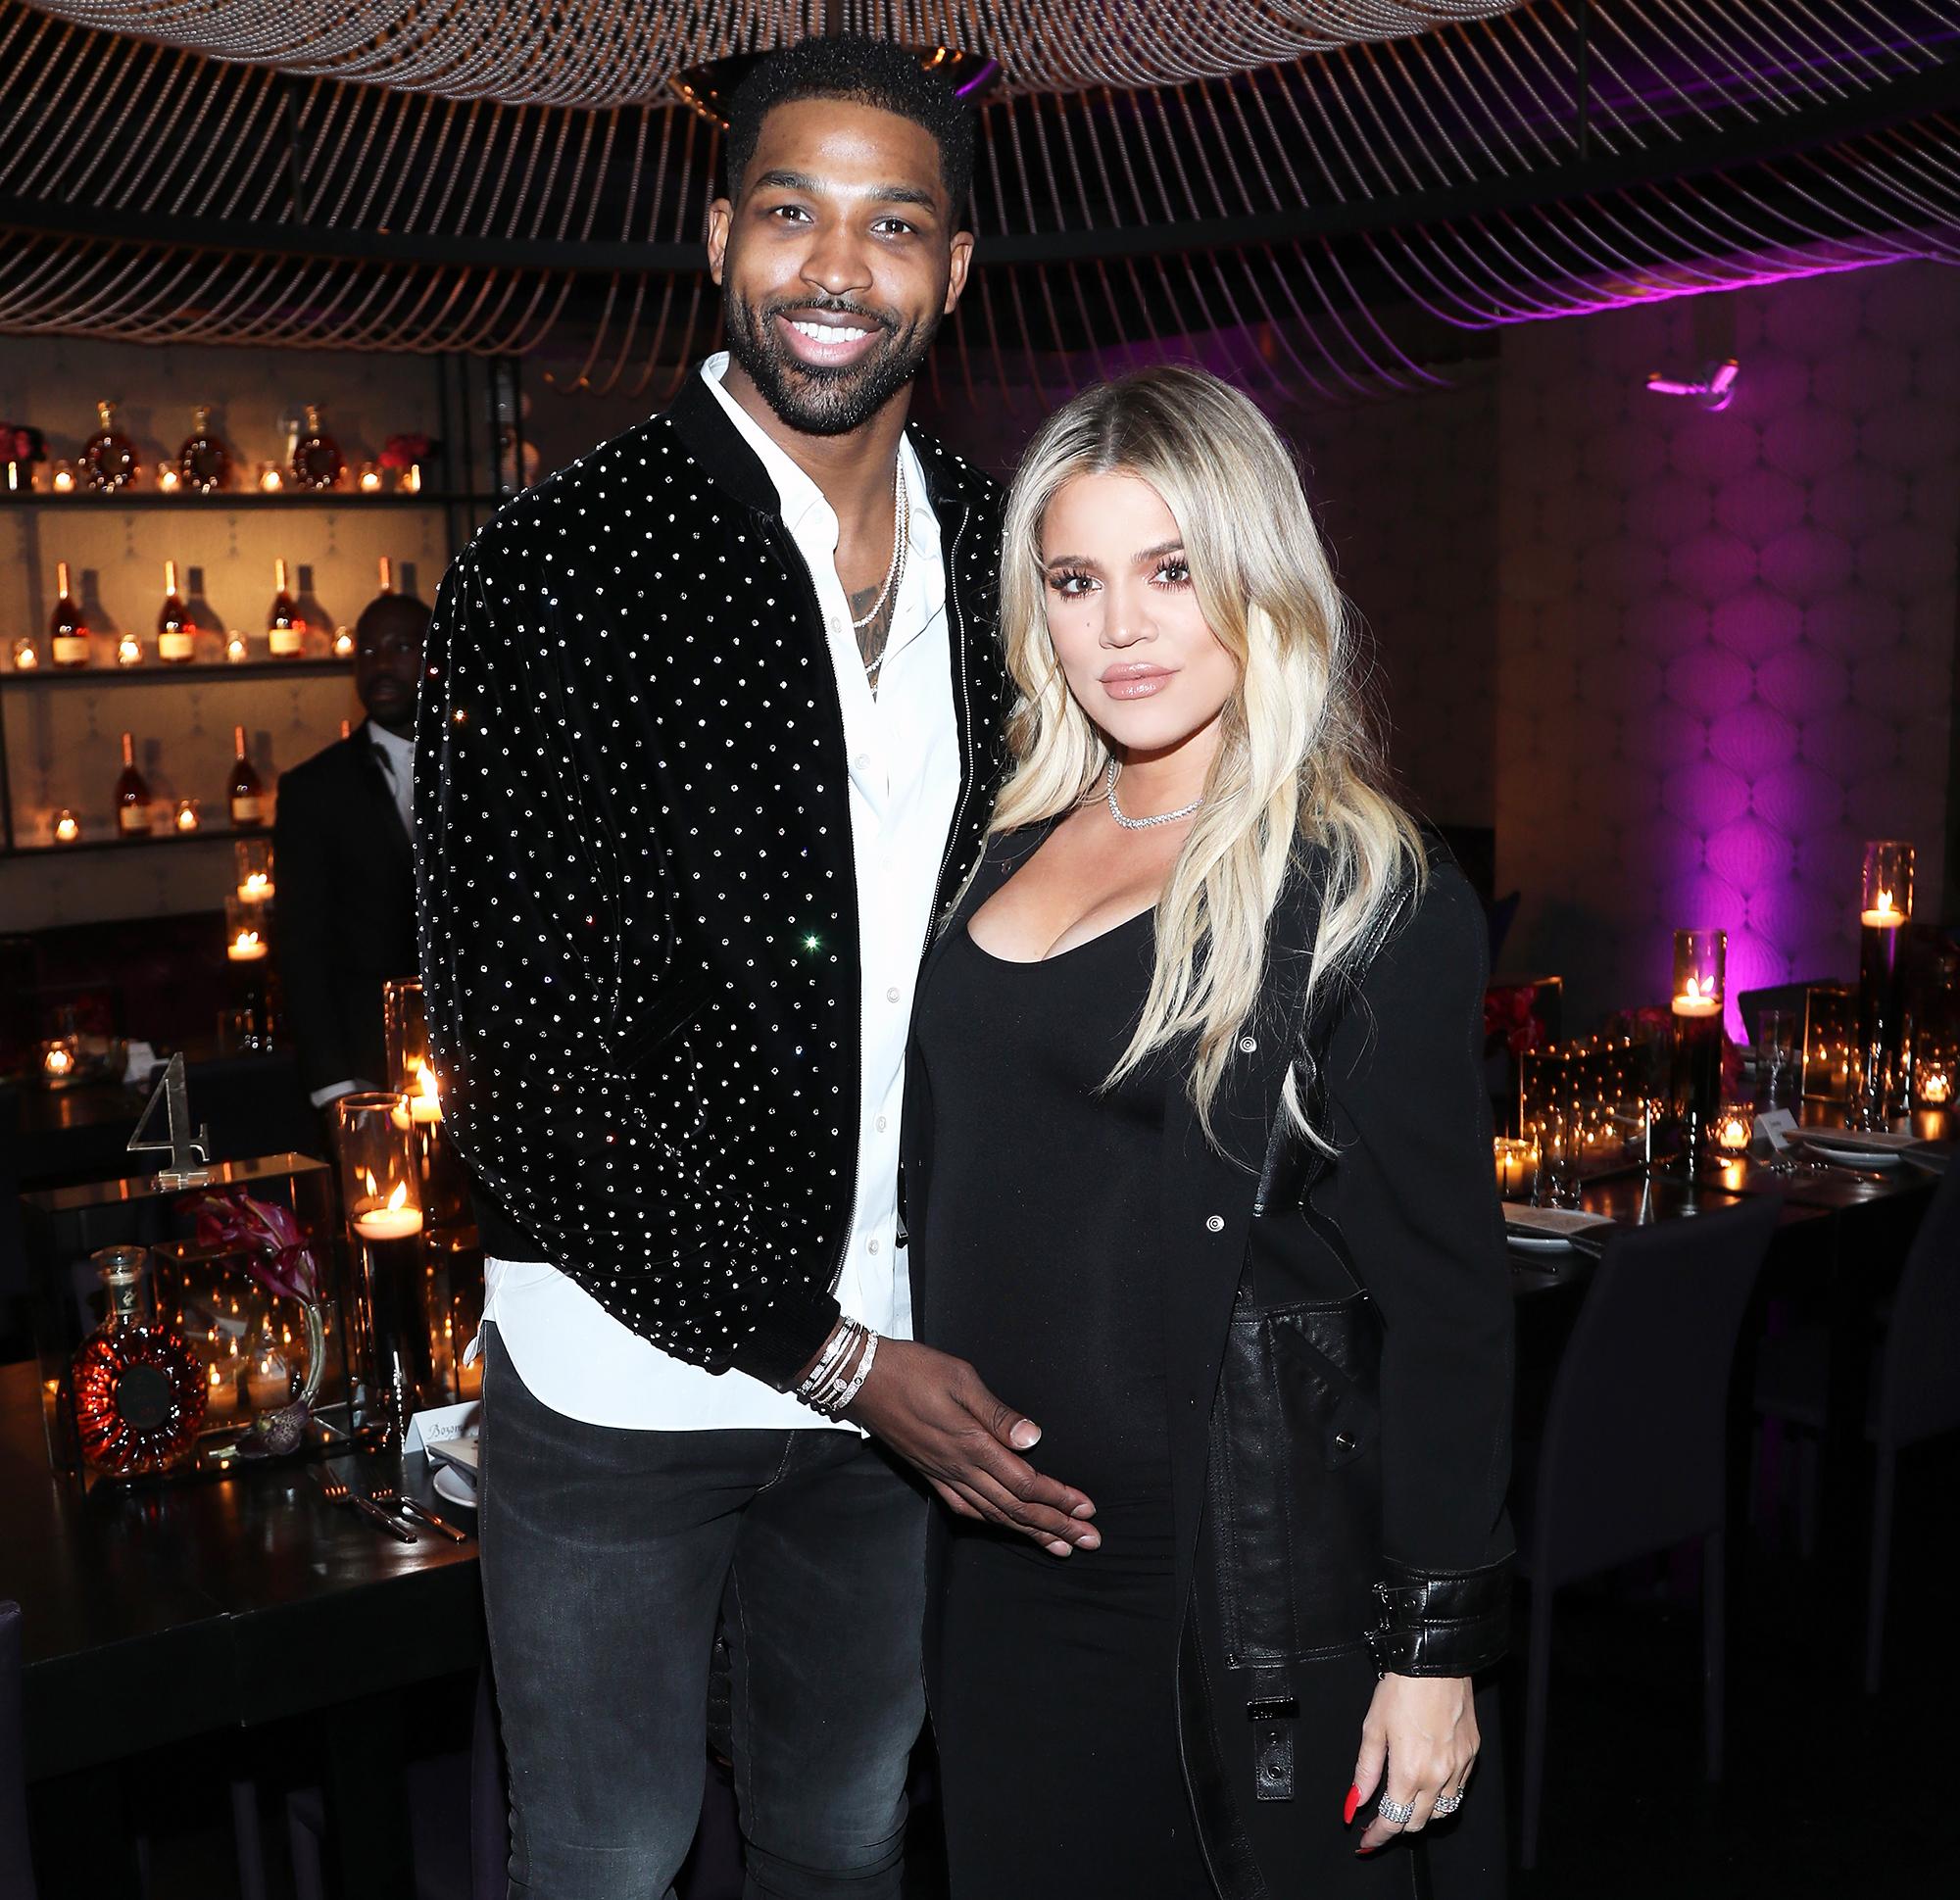 Khloe Kardashian Never Understand Tristan Thompson Scandal